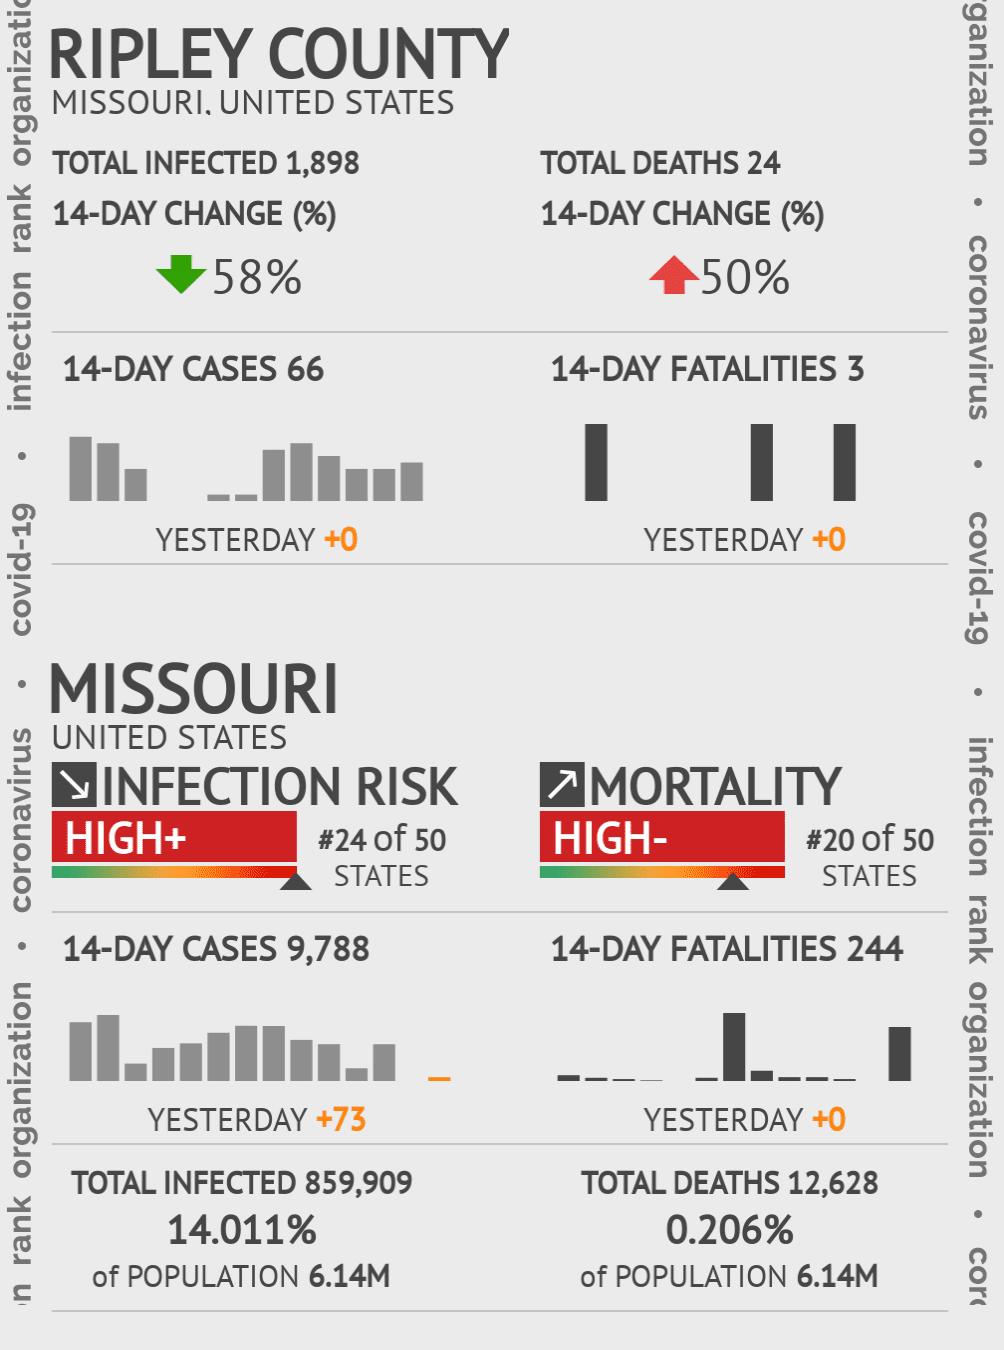 Ripley County Coronavirus Covid-19 Risk of Infection on July 24, 2021